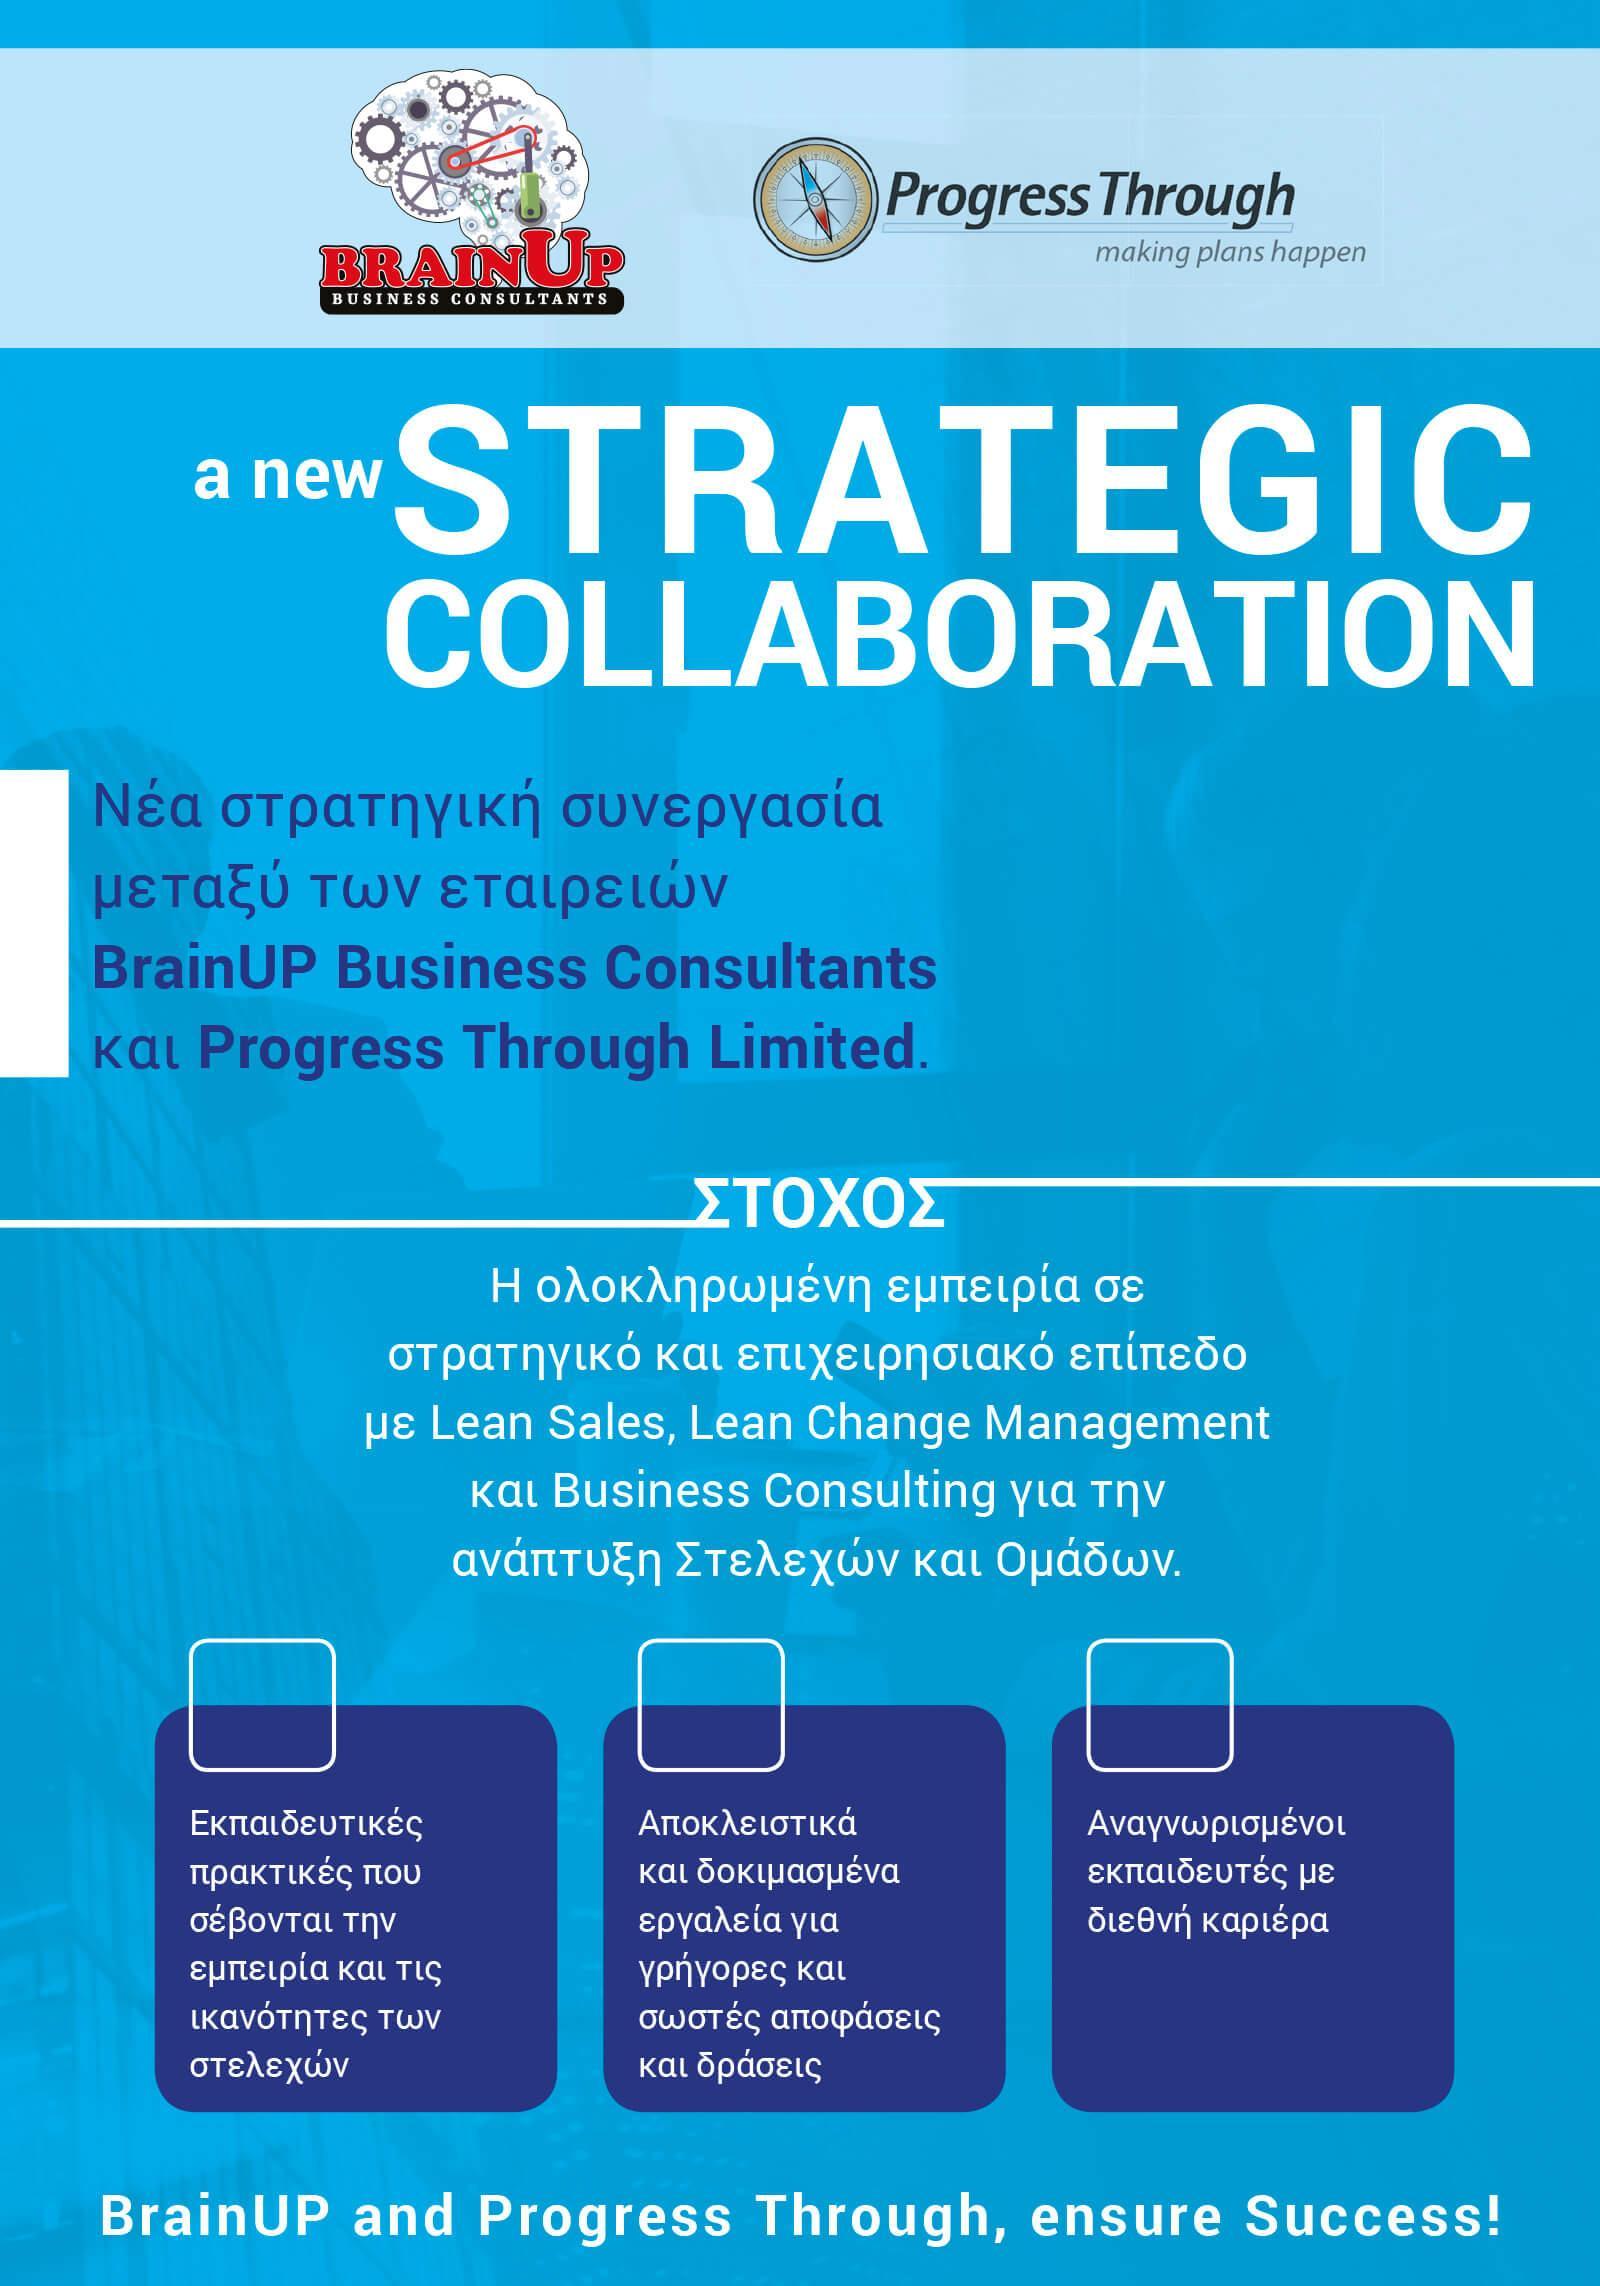 brainup new strategic collaboration